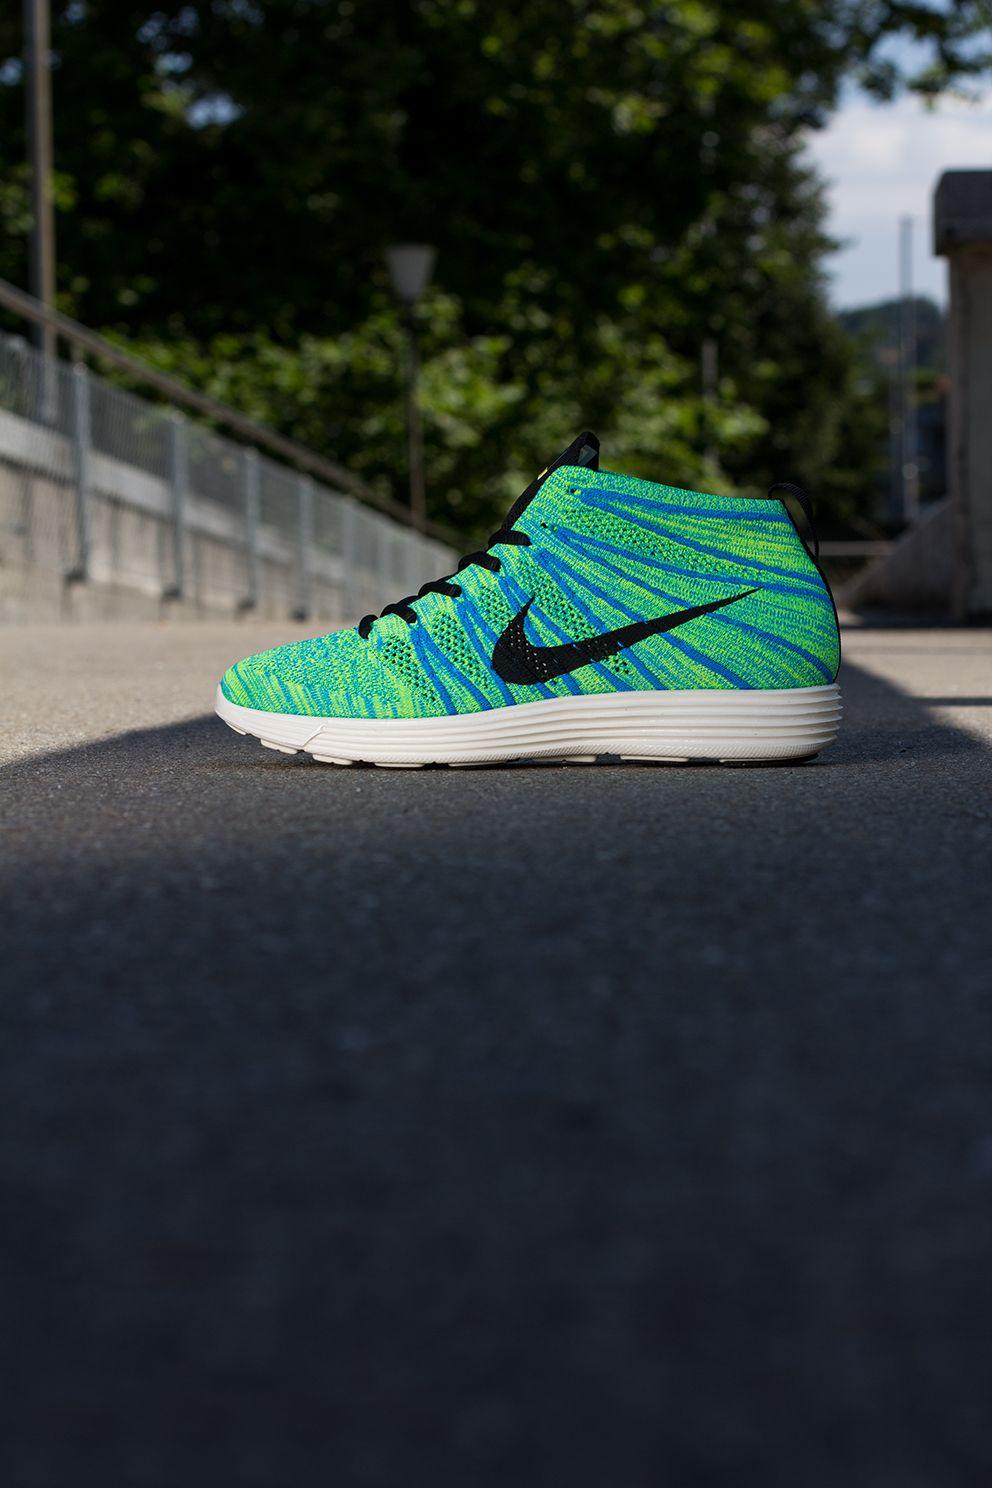 48df1a0e38b1 Nike Lunar Flyknit Chukka